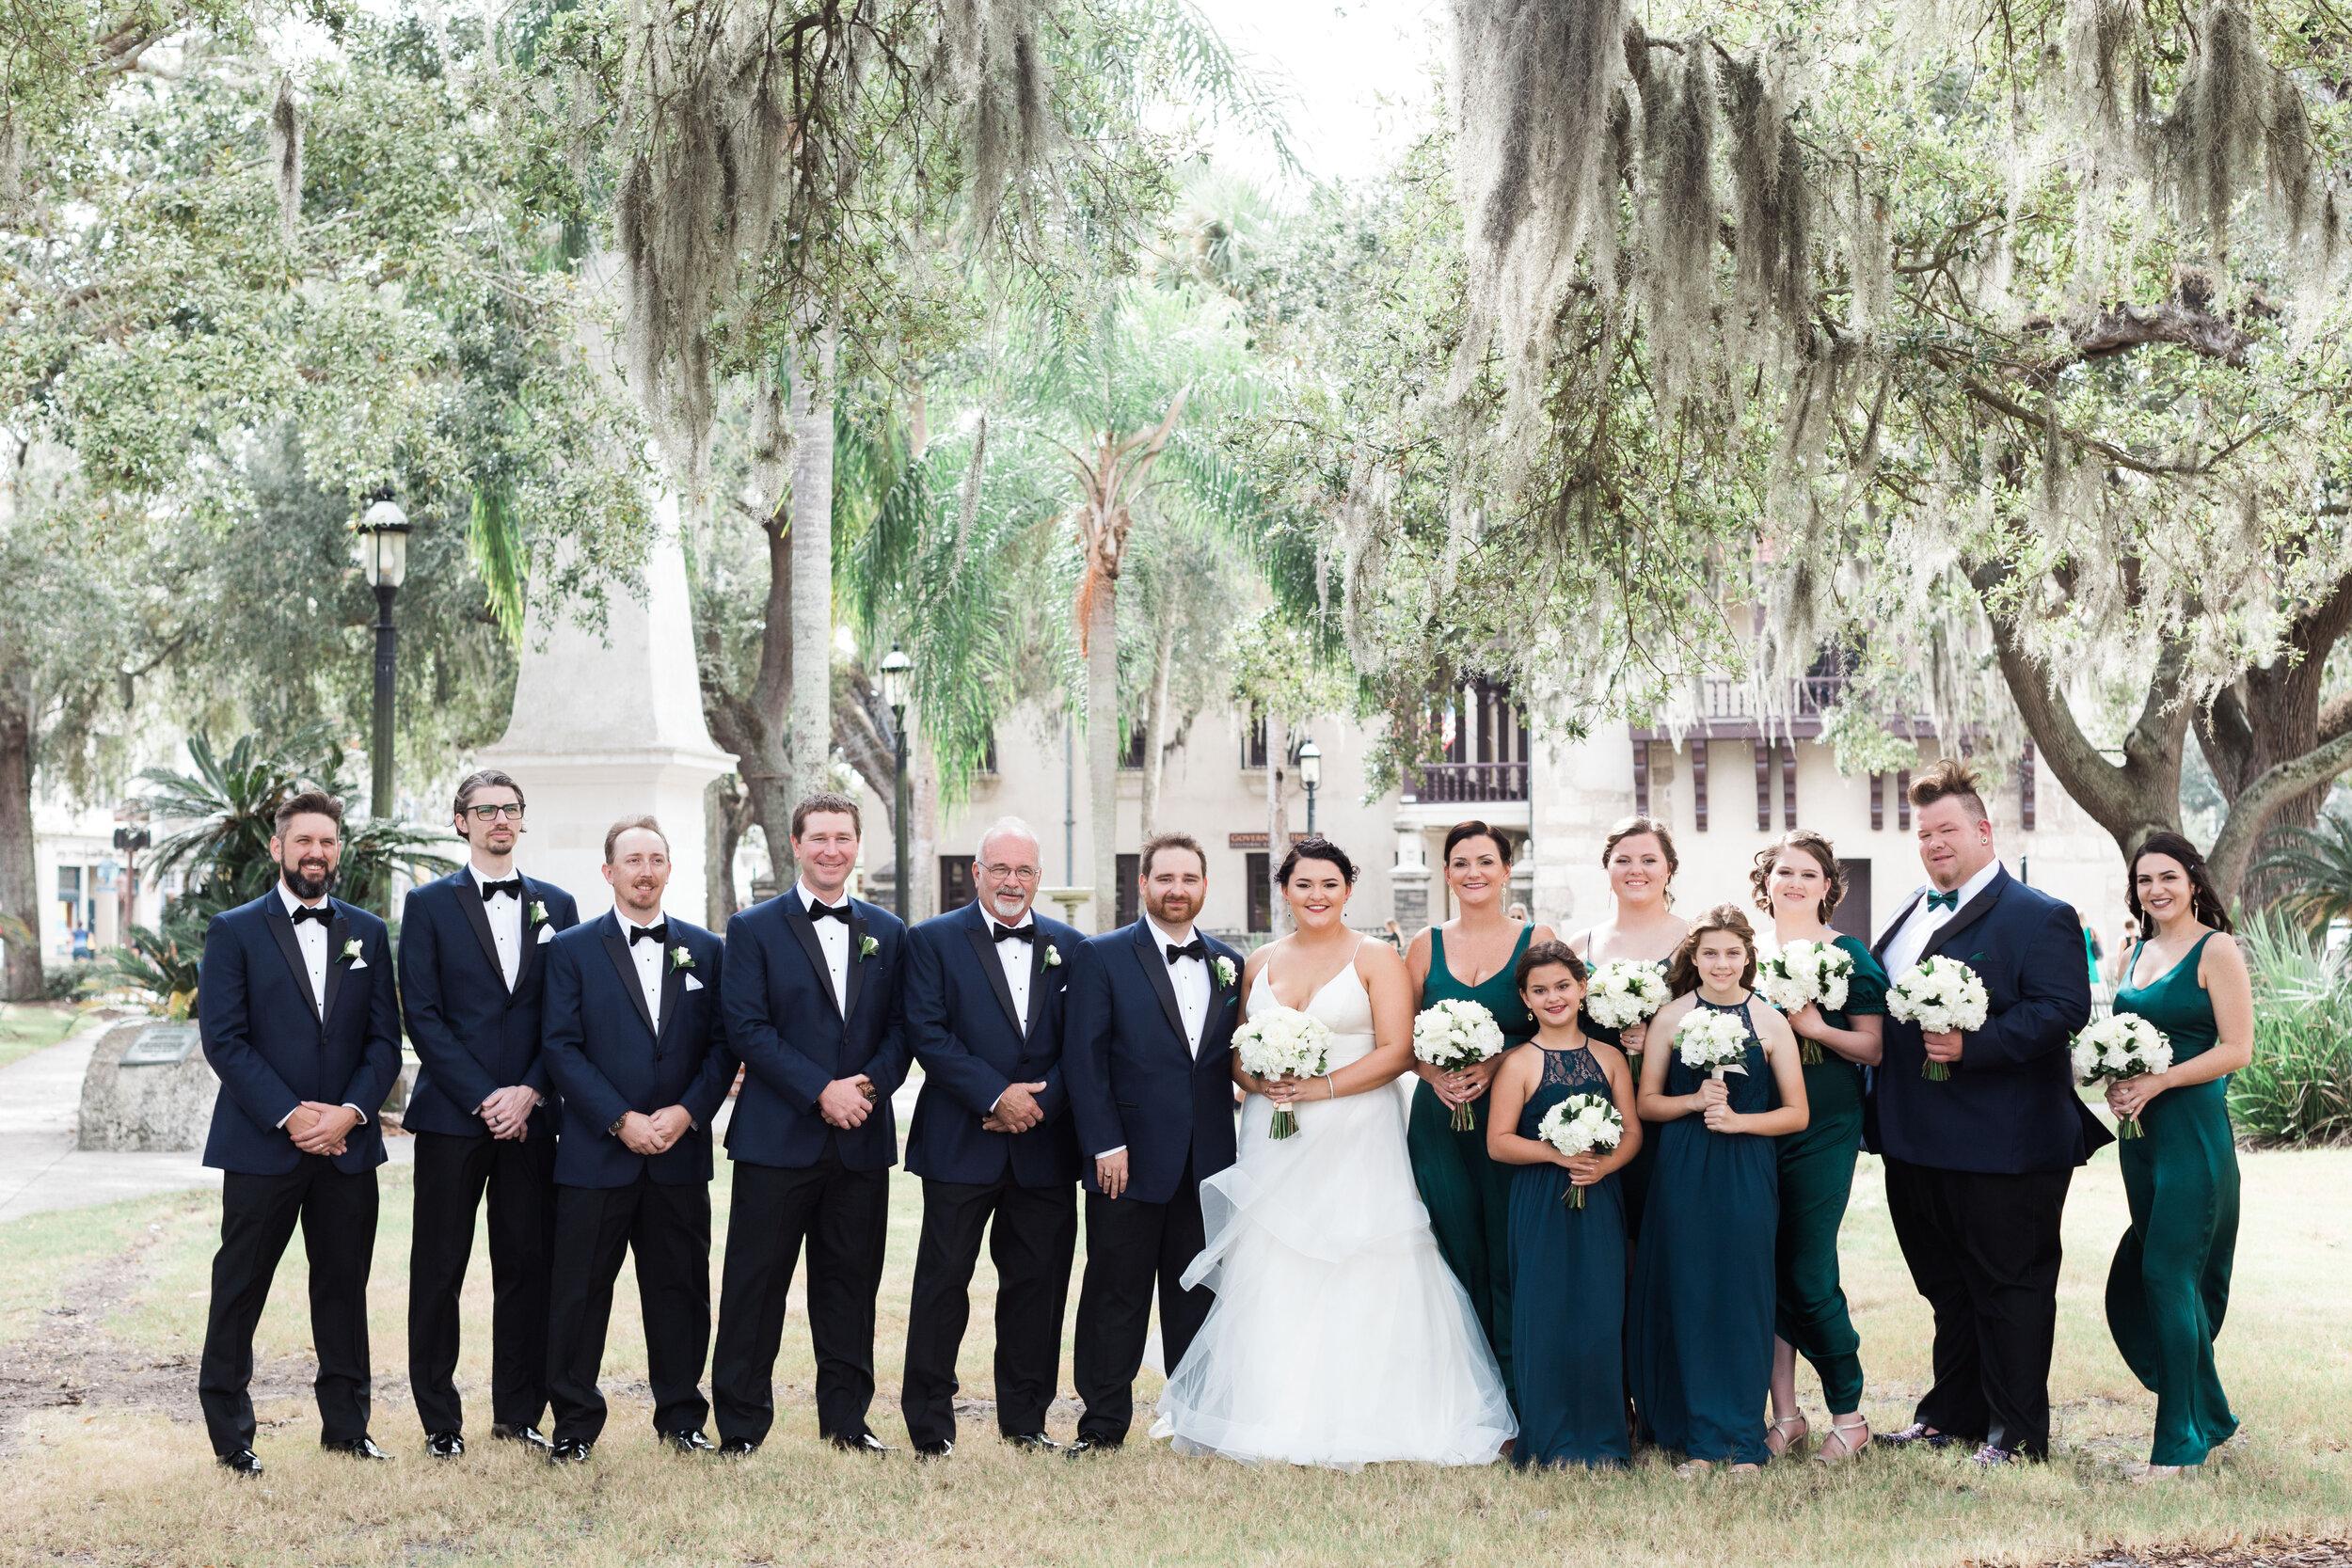 St_Augustine_Wedding_Photography_Treasury_on_the_Plaza_Wedding__0032_.jpg